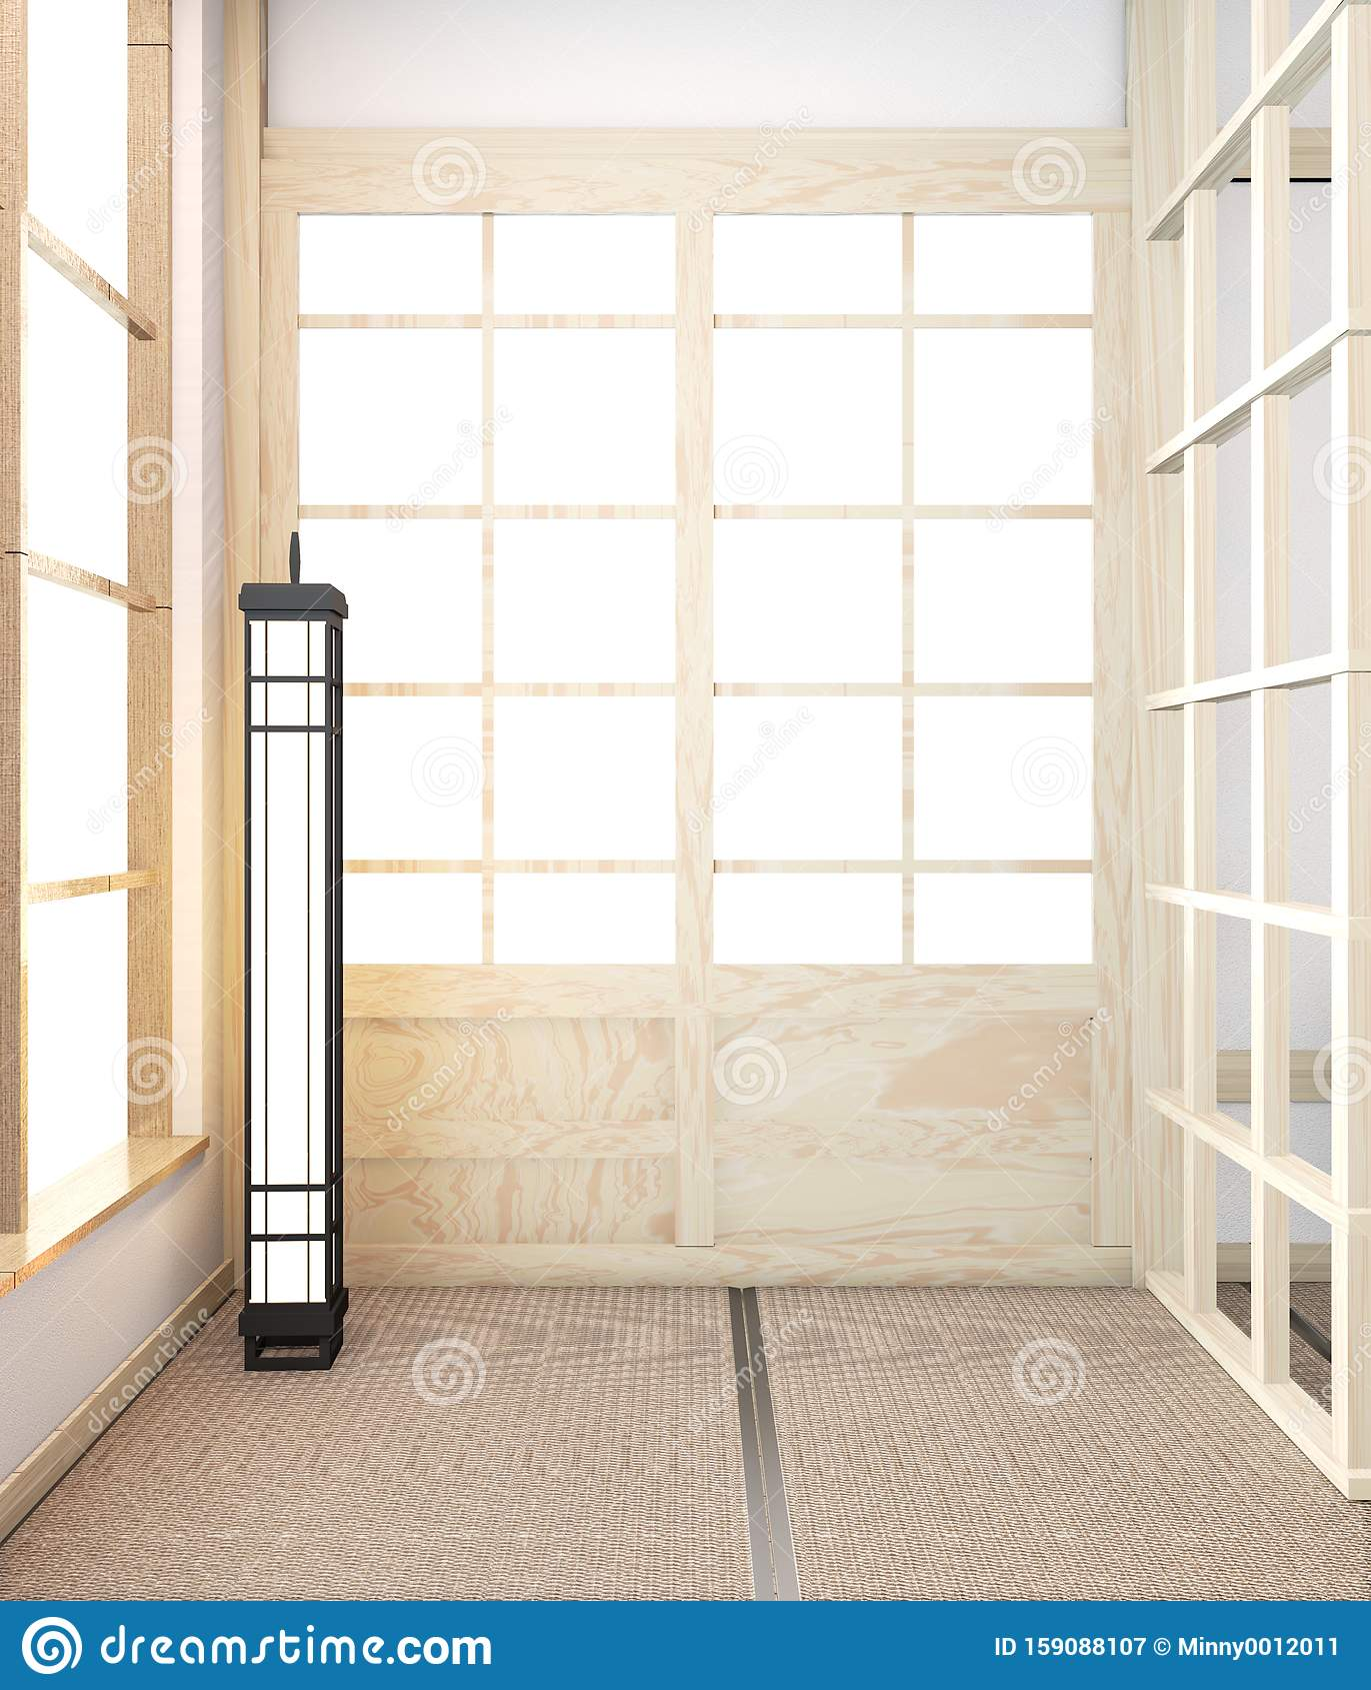 Idea of Mock up Empty room wooden japanese minimal original design and tatami mat floor.3D rendering